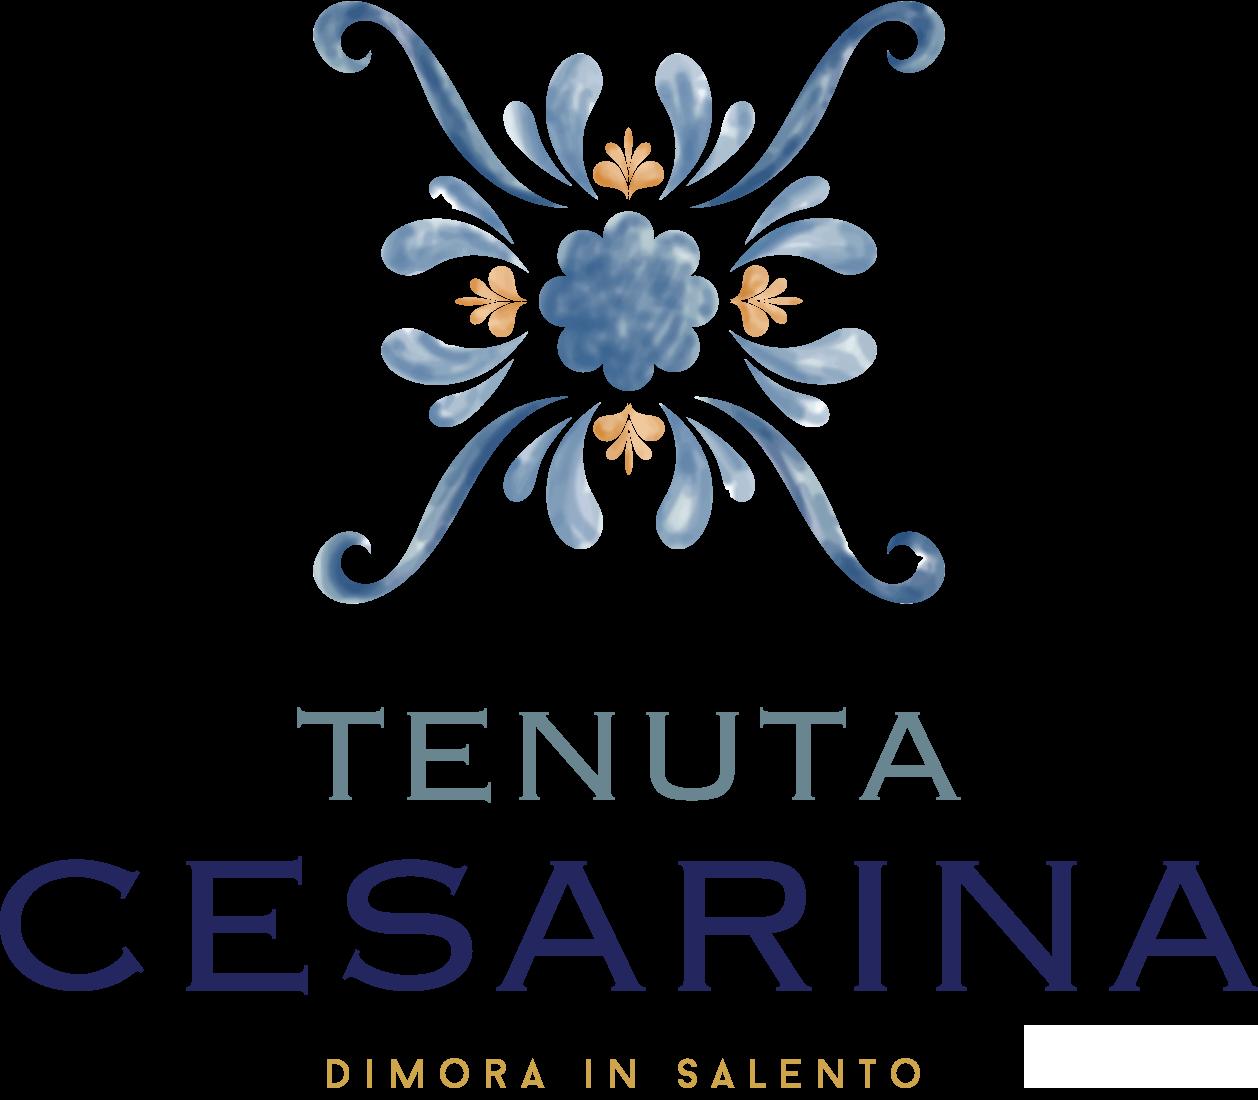 Tenuta Cesarina